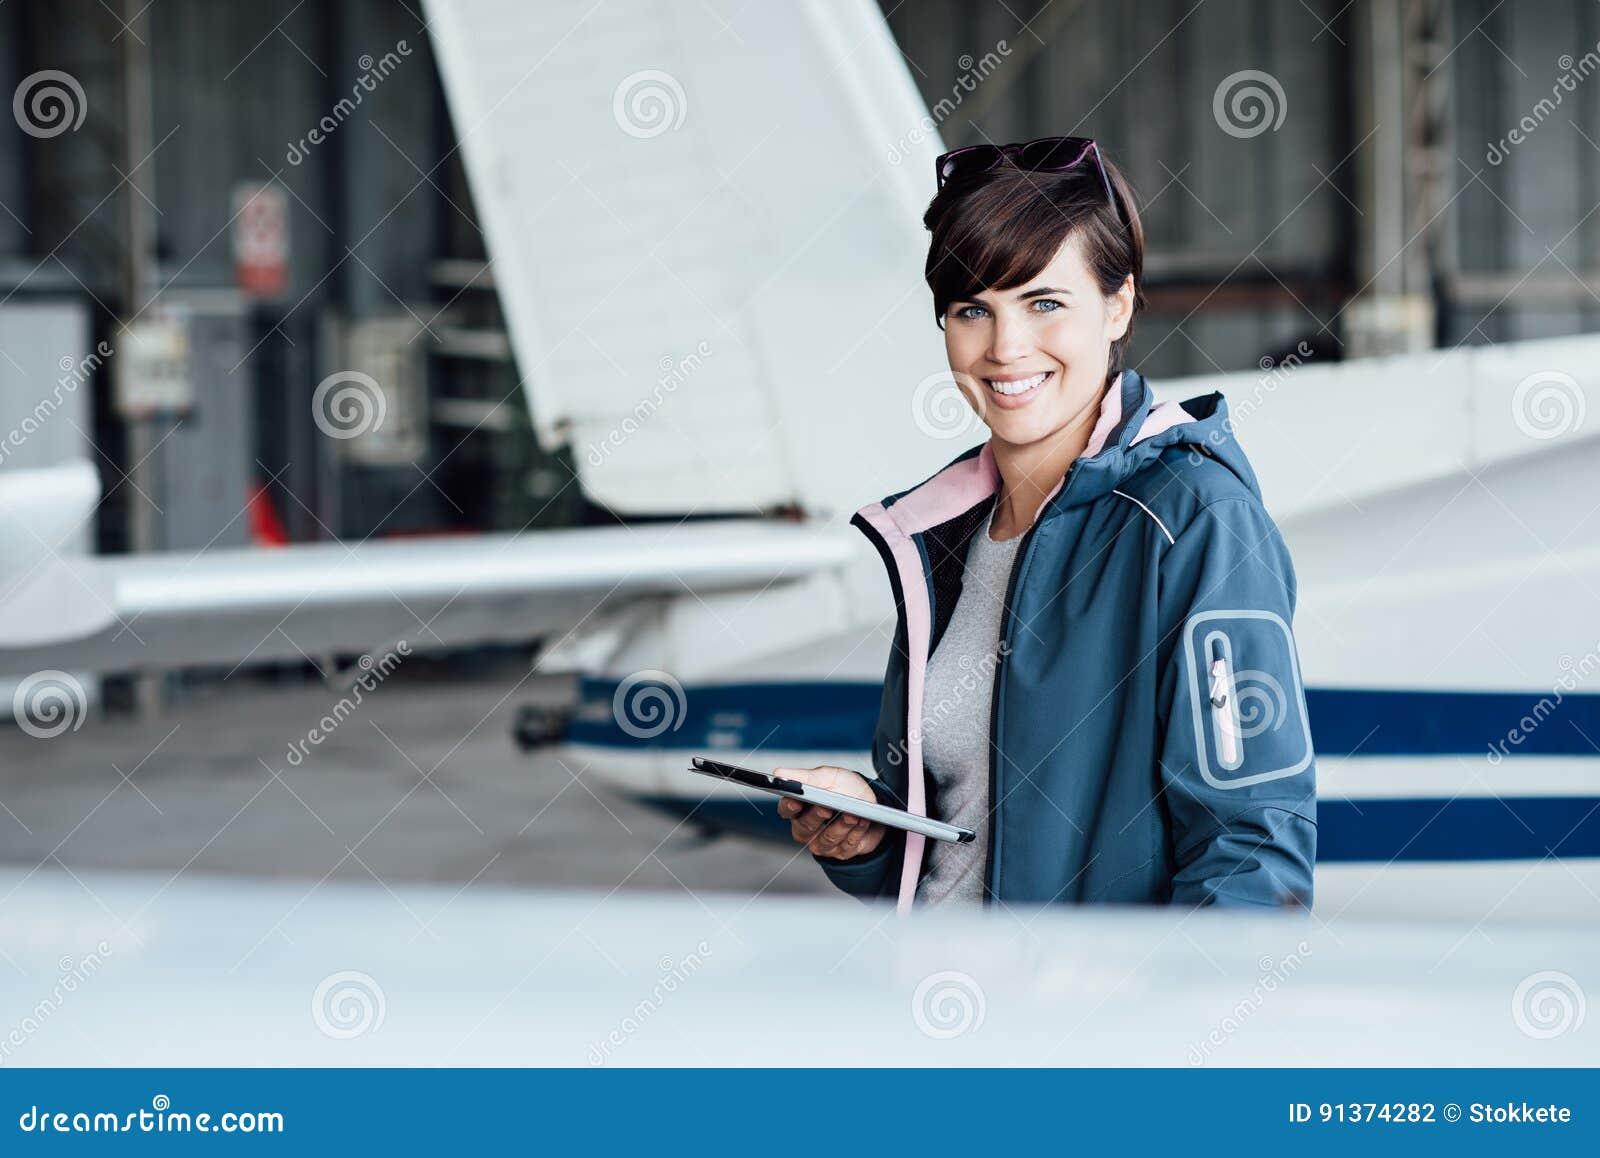 Piloto usando uma tabuleta digital